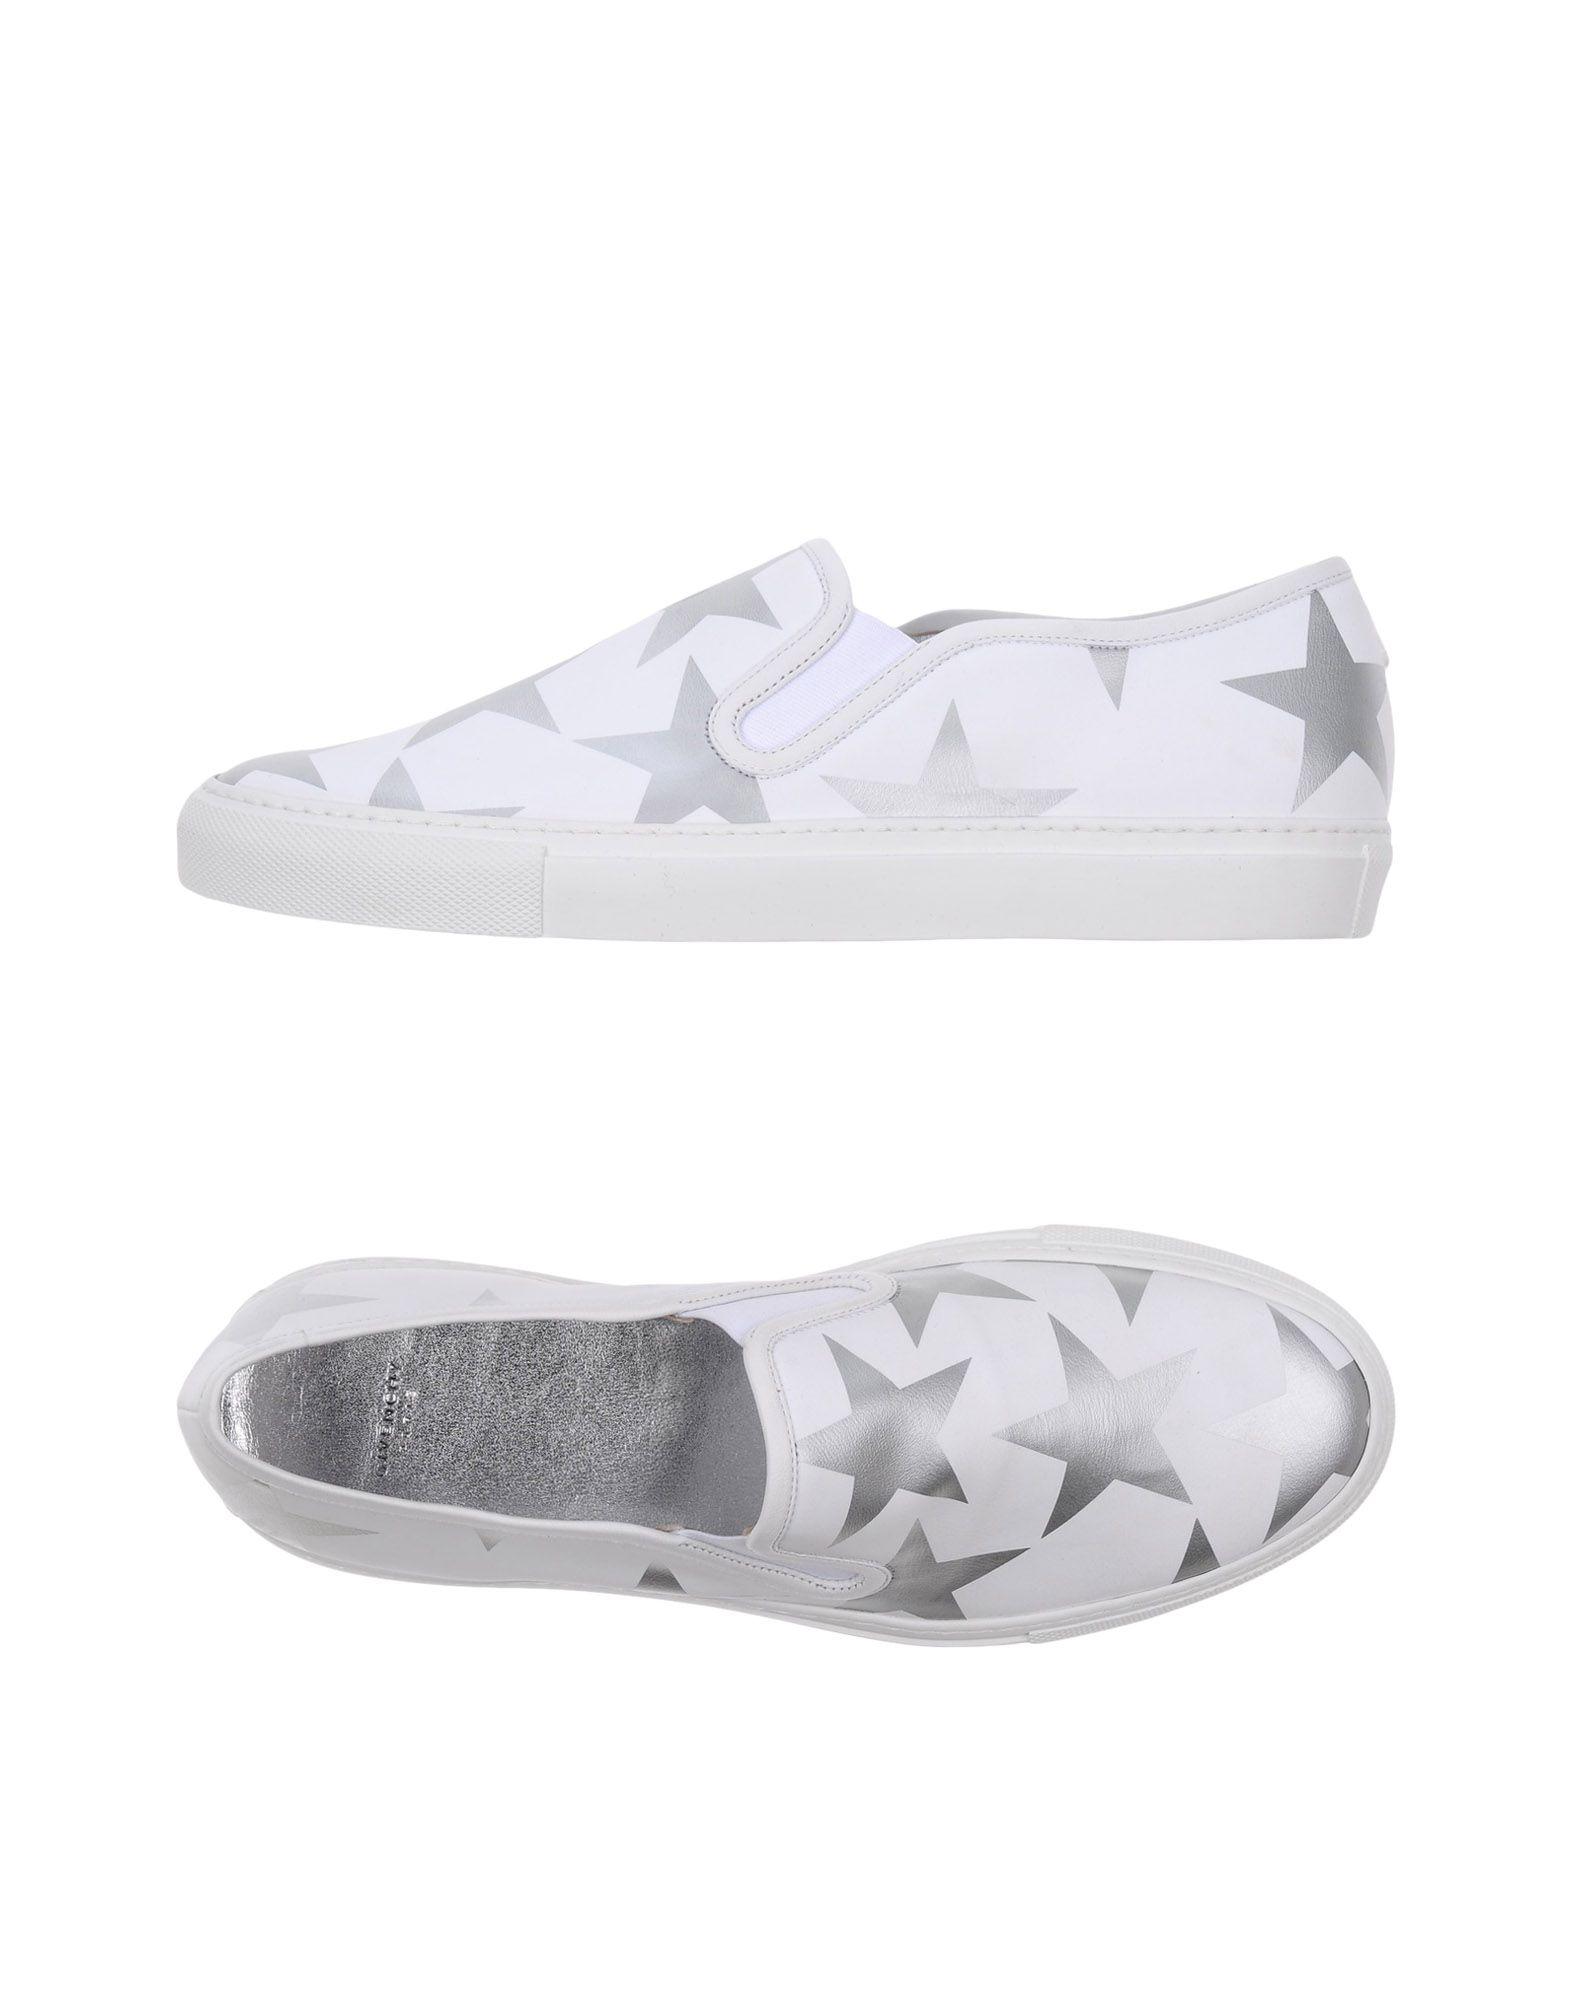 Givenchy Sneakers Sneakers - Women Givenchy Sneakers Givenchy online on  Australia - 11126311KM d3b1b3